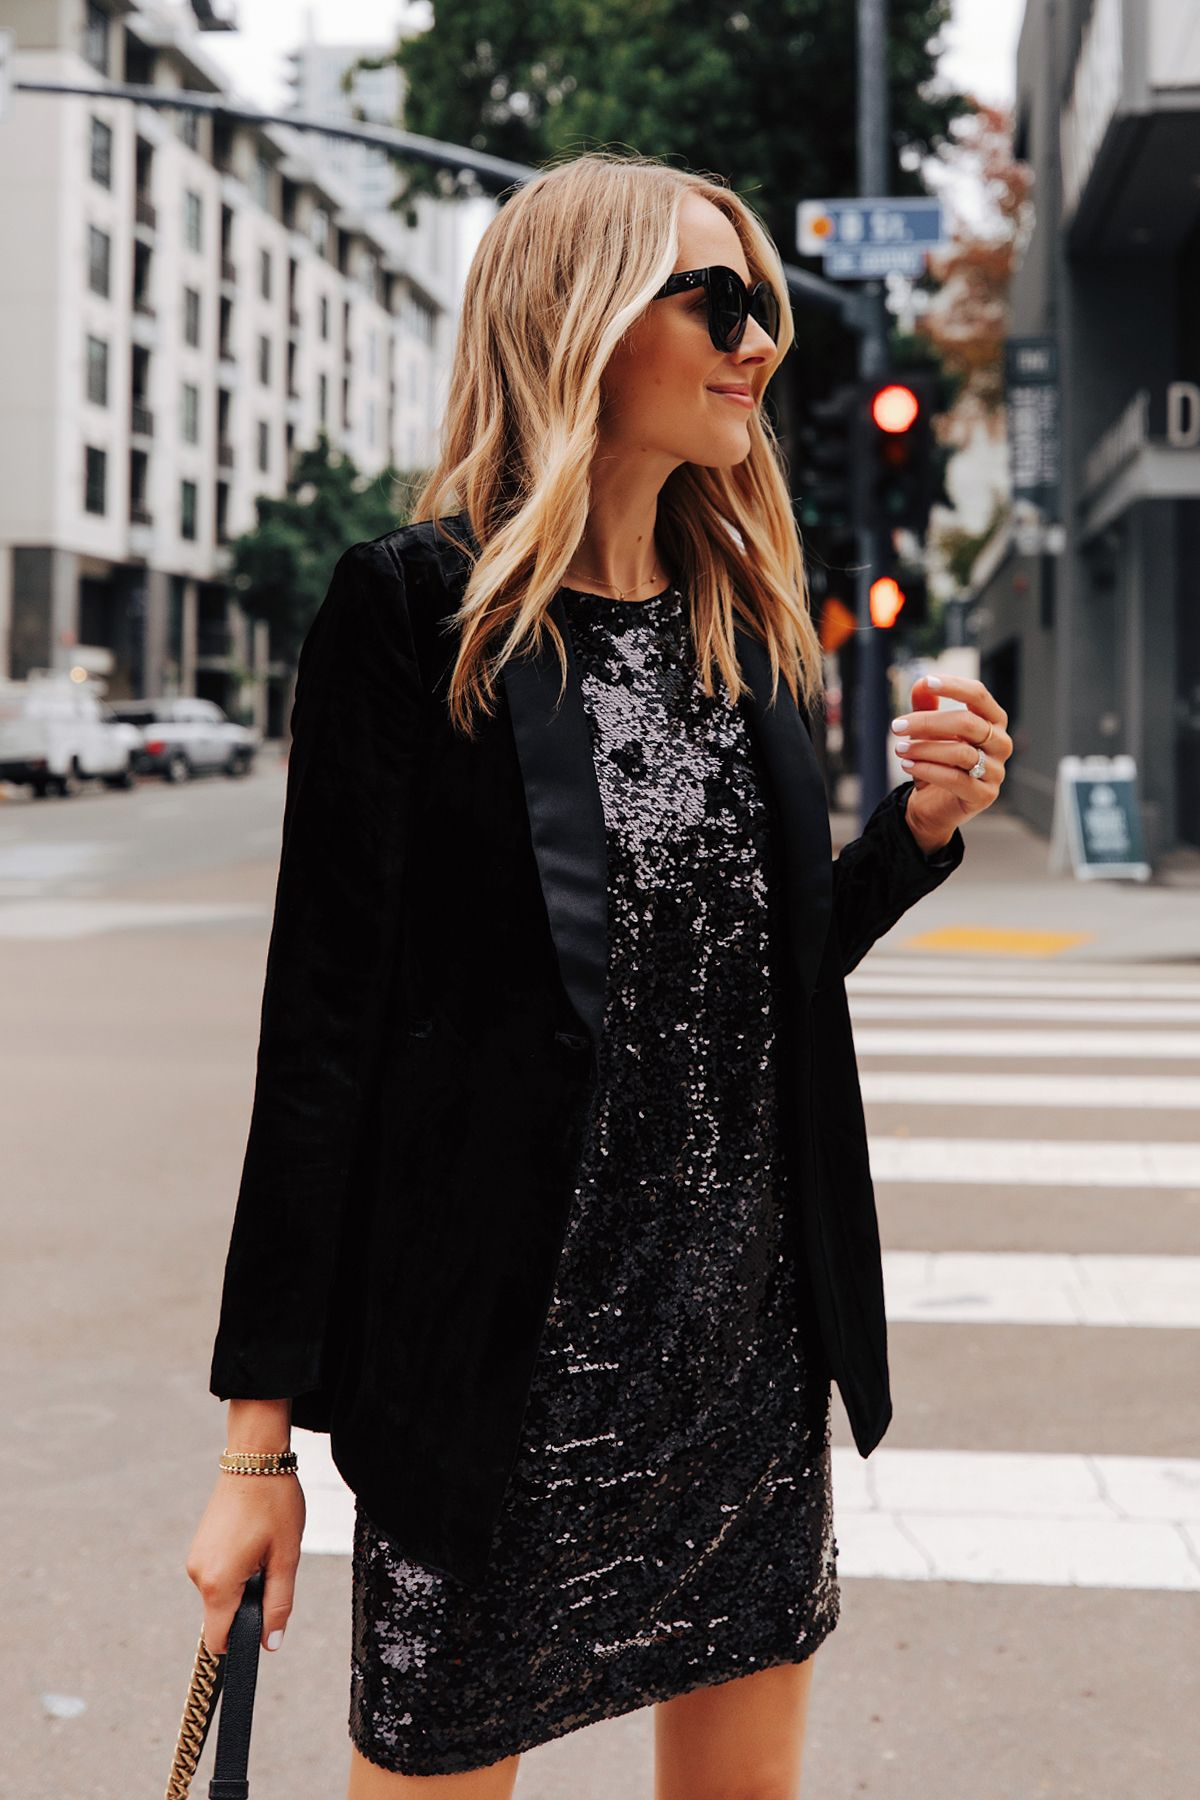 Fashion Jackson Wearing Walmart Black Velvet Blazer Black Sequin Dress 1 Fashion Jackson Fashion Fashion Outfits [ 1800 x 1200 Pixel ]